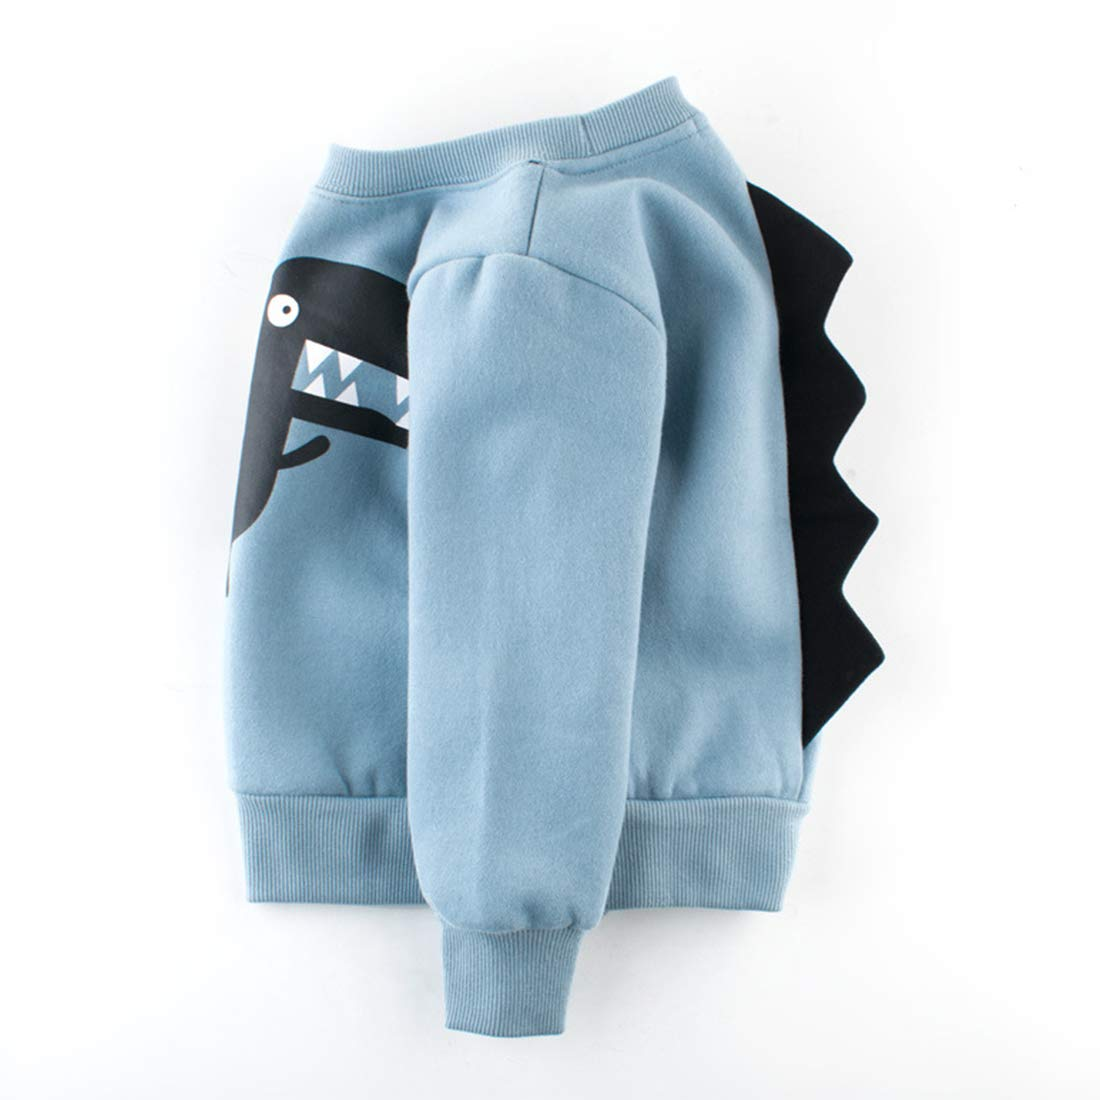 queenland Kids Slouchy Cute Dinosaur Cotton Sweatshirt Pullover Toddler Tops Blouse